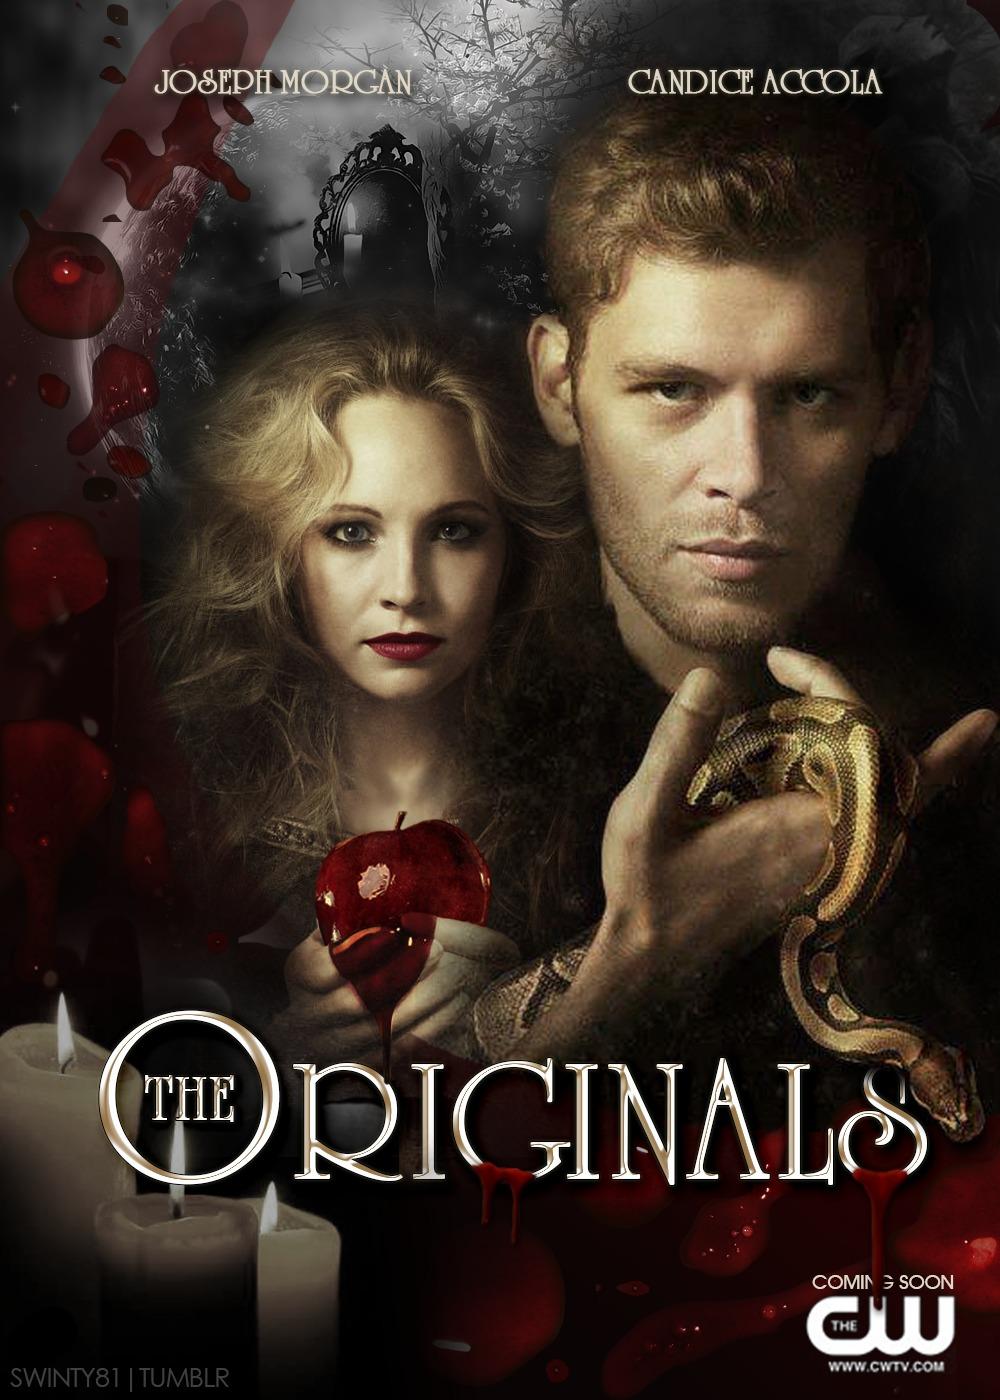 The Vampire Diaries (novel series)